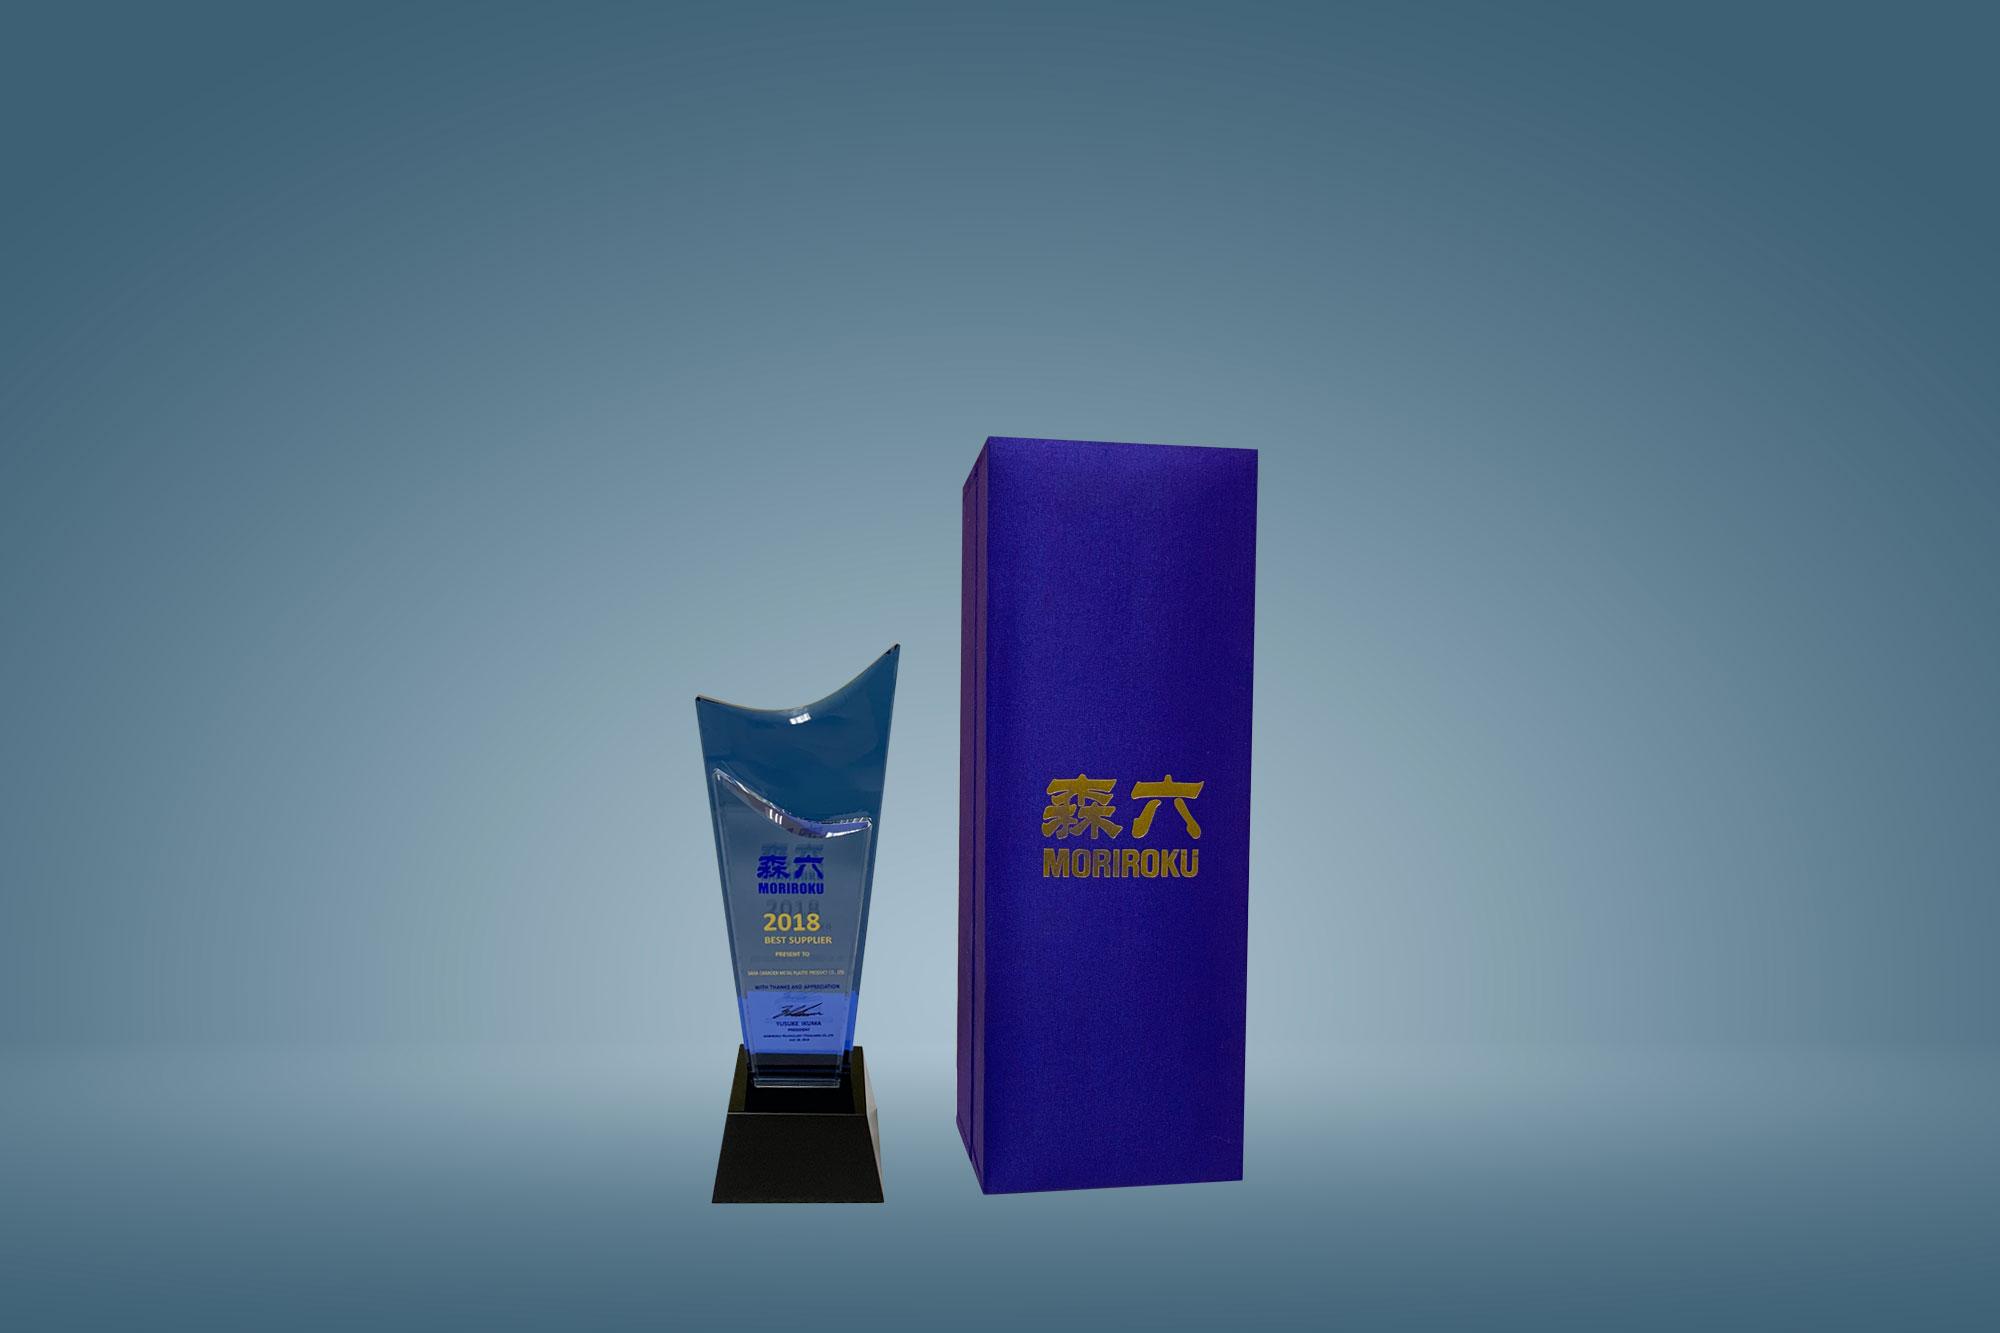 SCMP ได้รับมอบรางวัล The Best Supplier Award